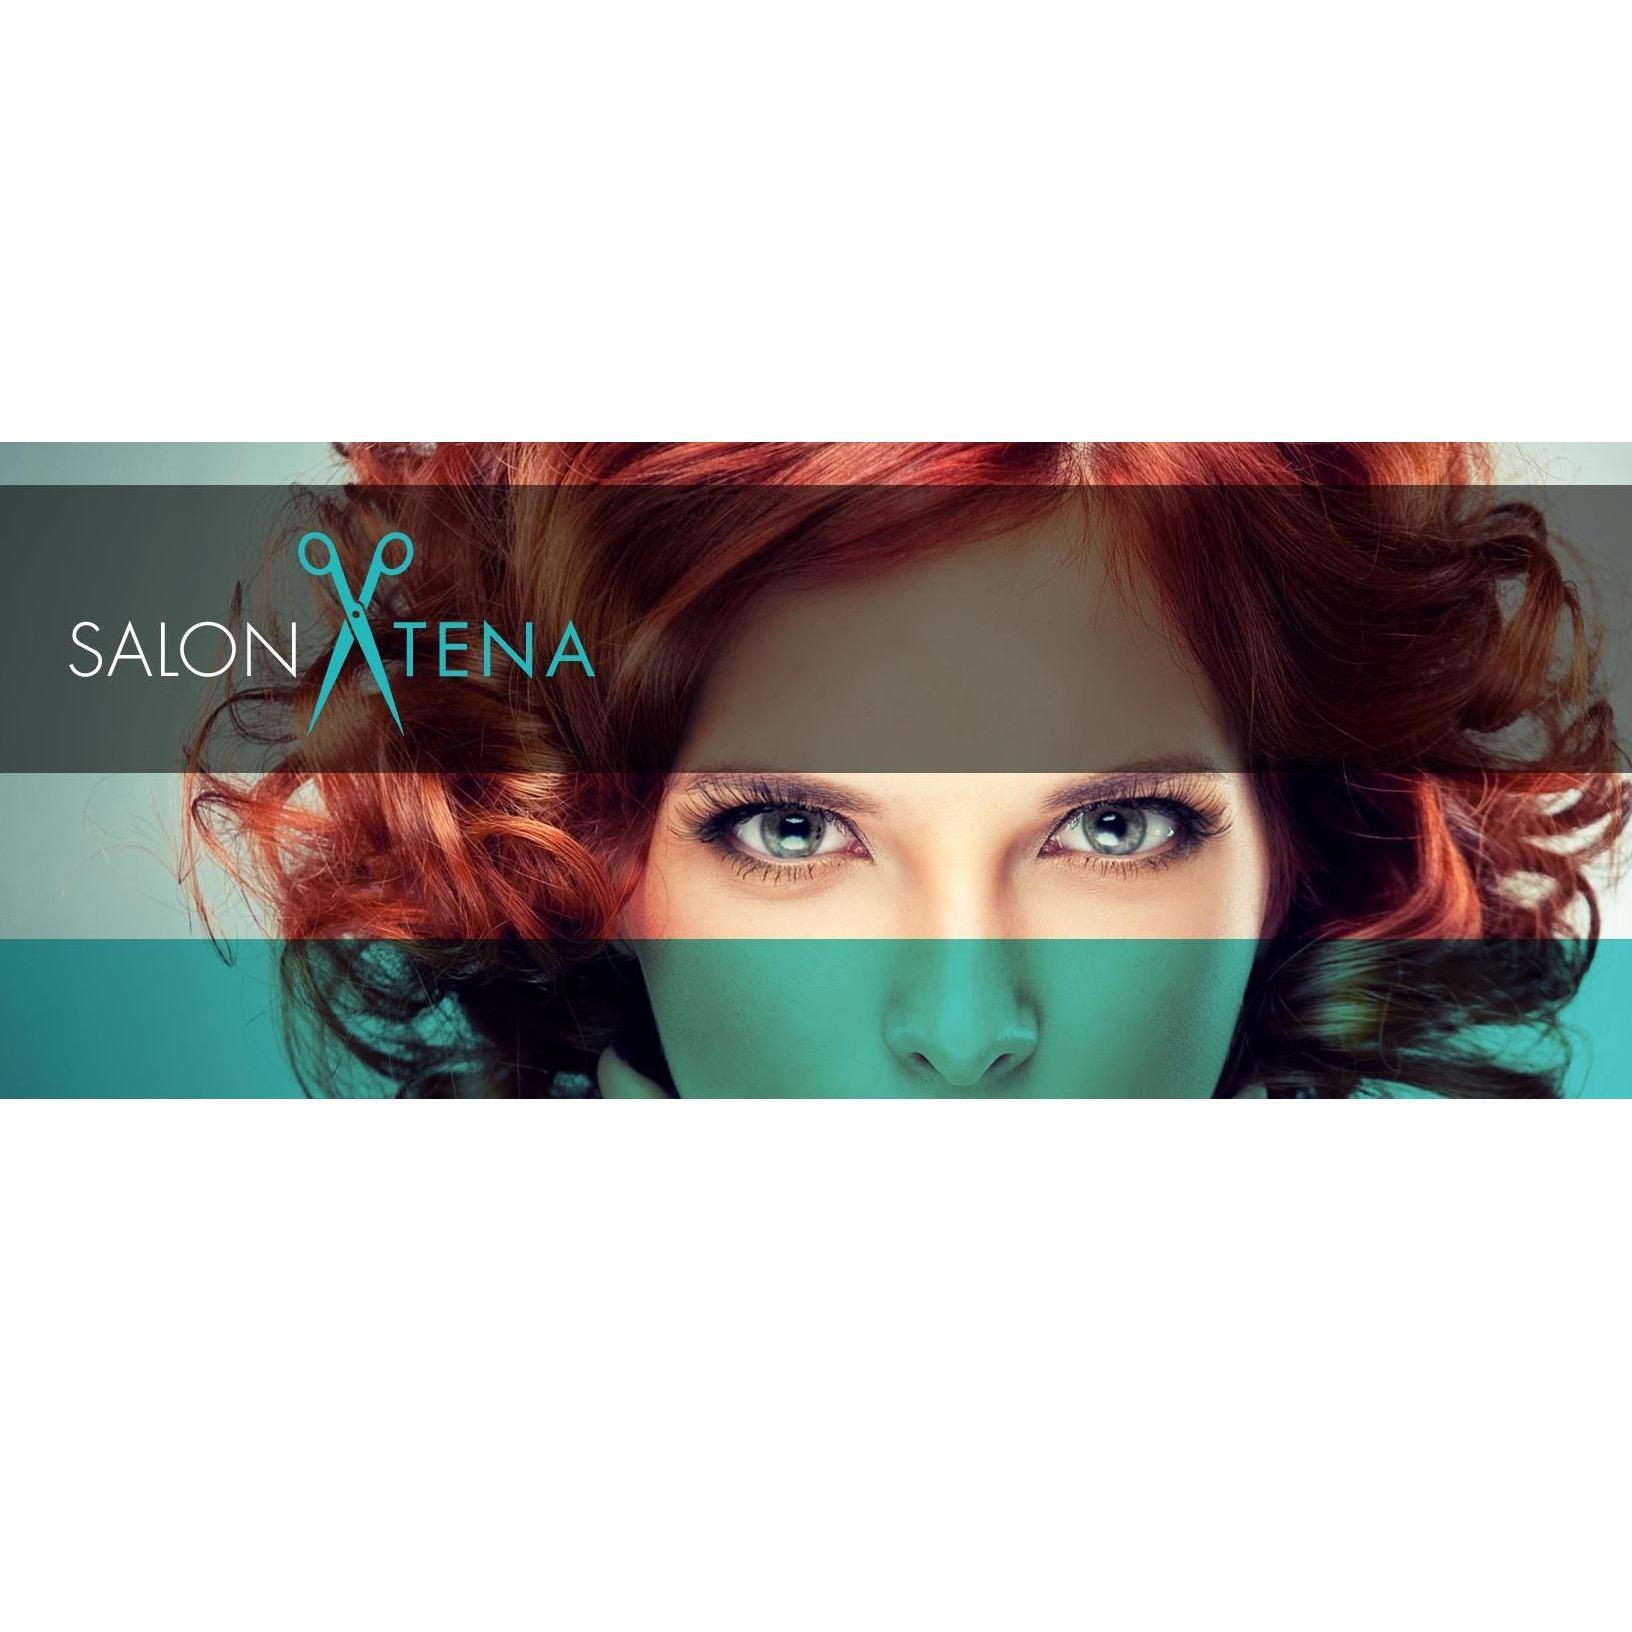 Salon Xtena - Winter Park, FL - Beauty Salons & Hair Care